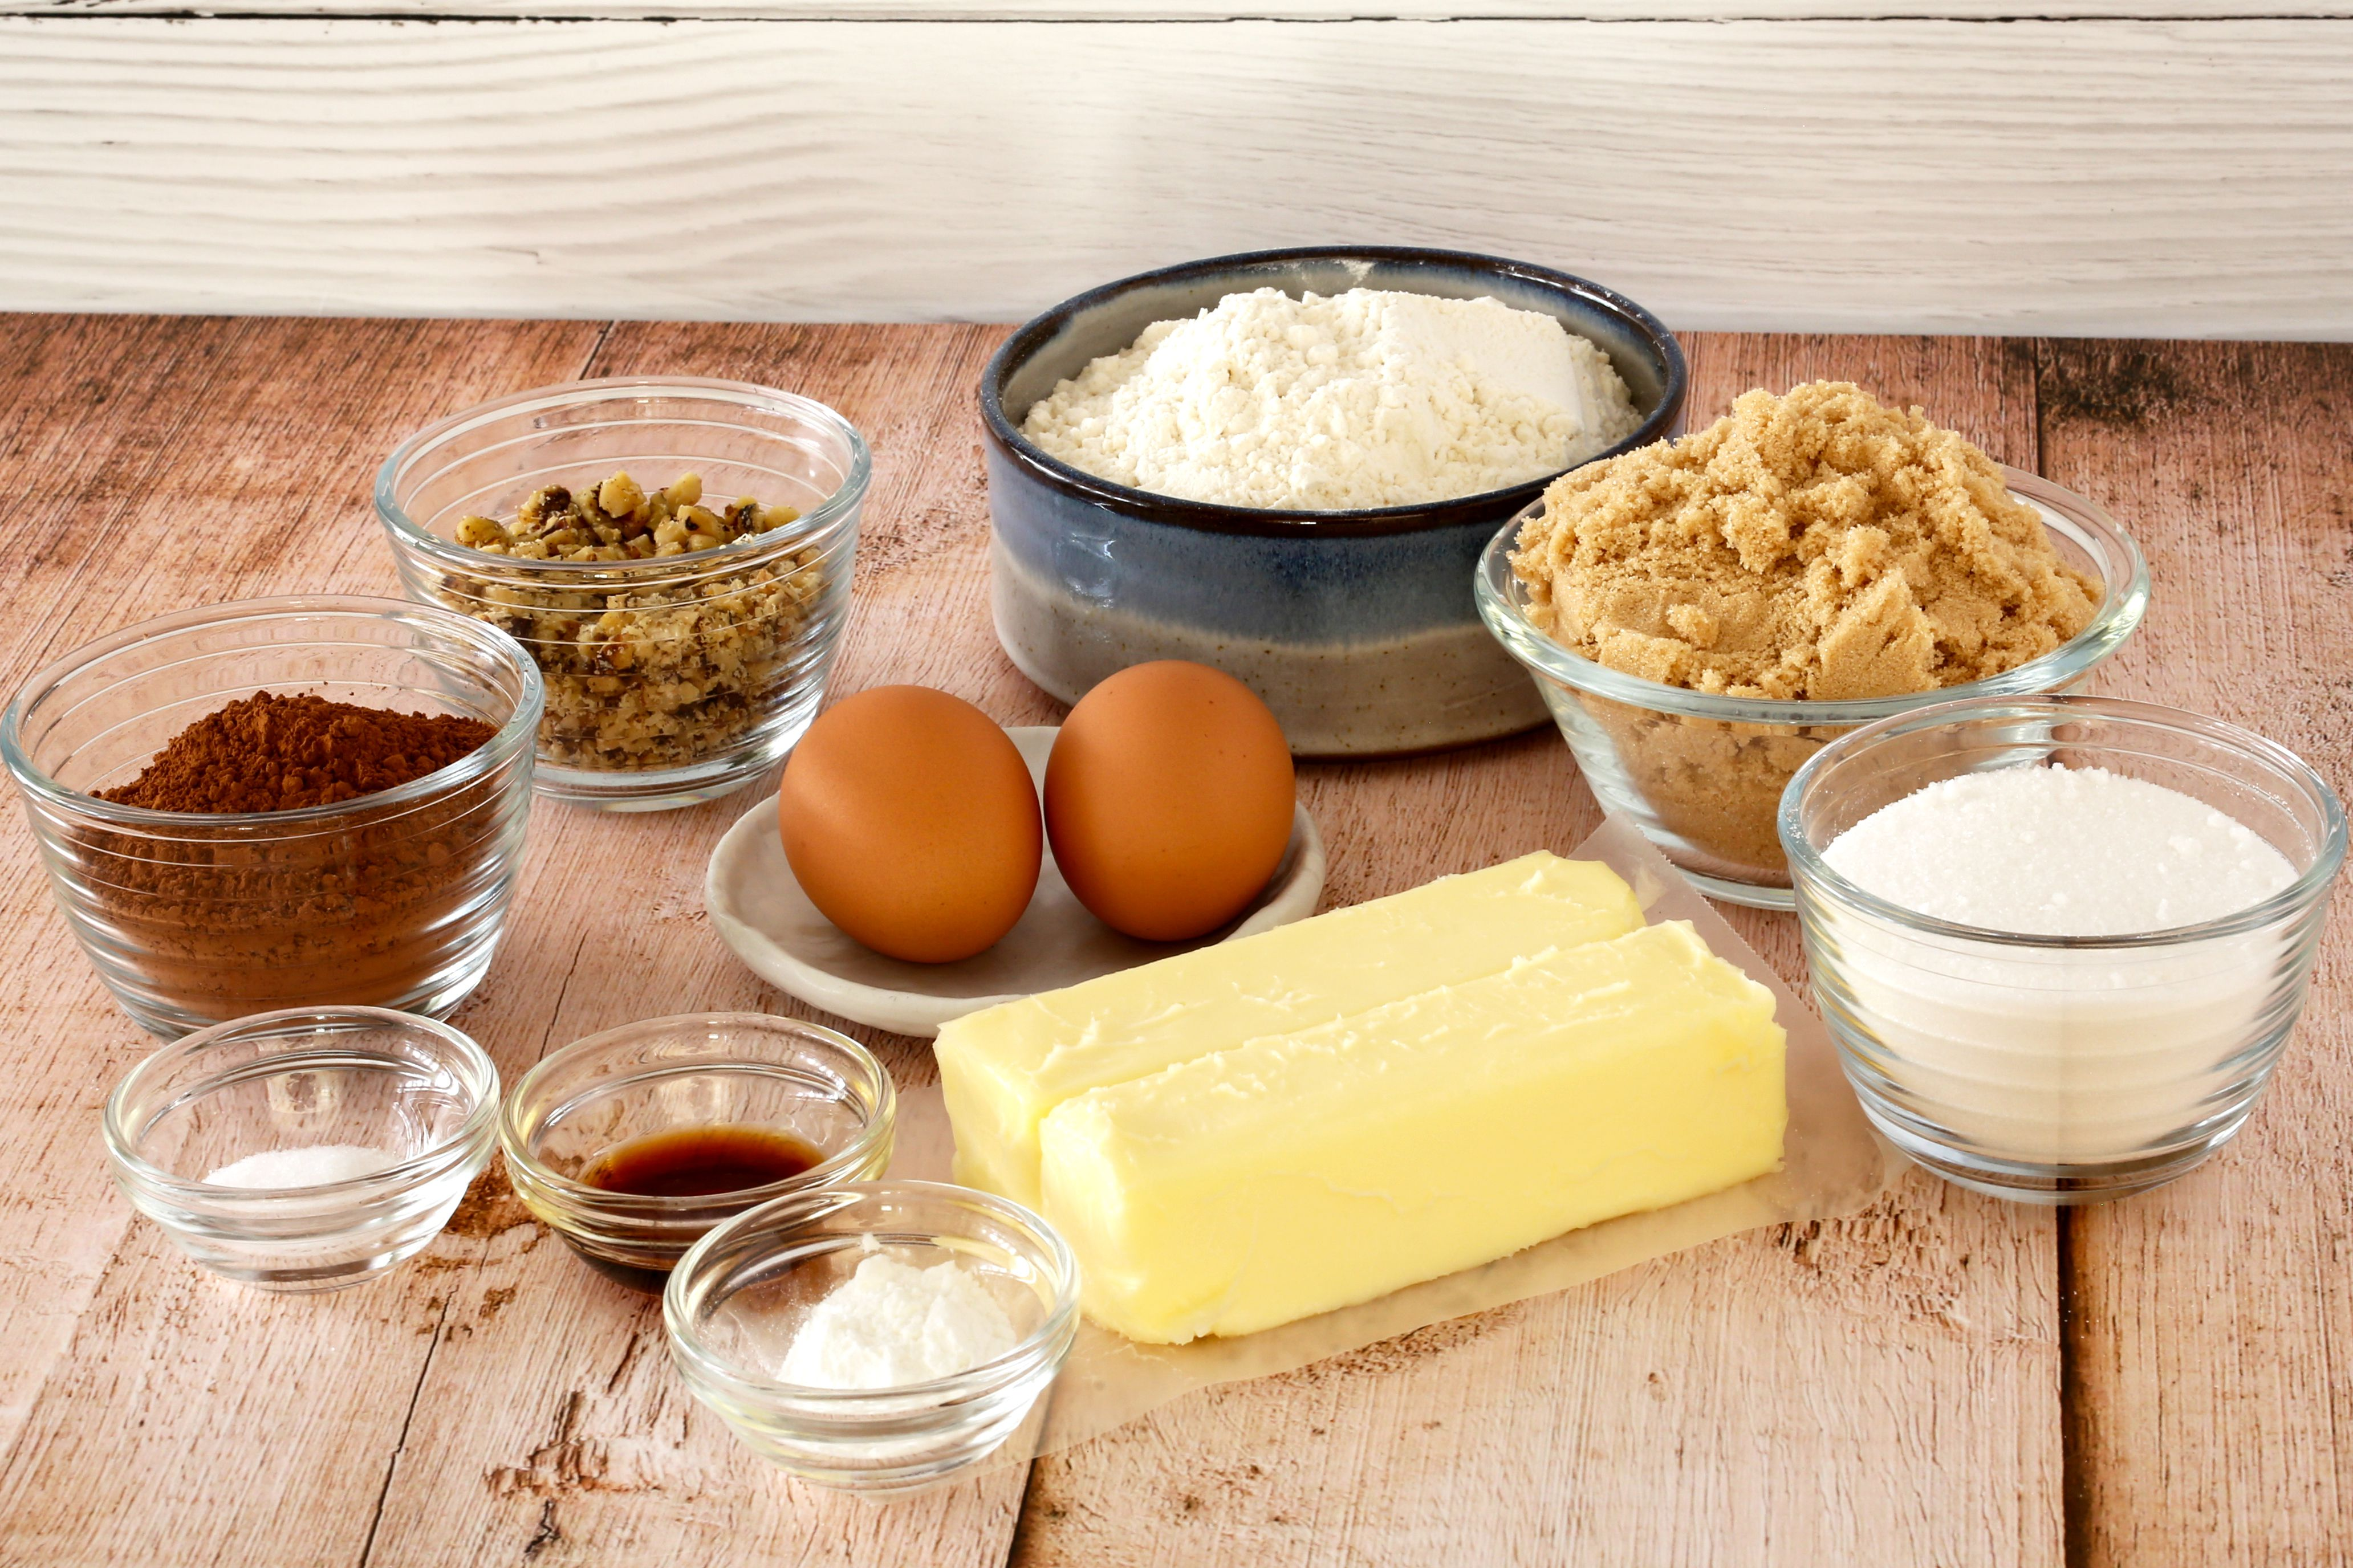 Ingredients for chocolate drop cookies.